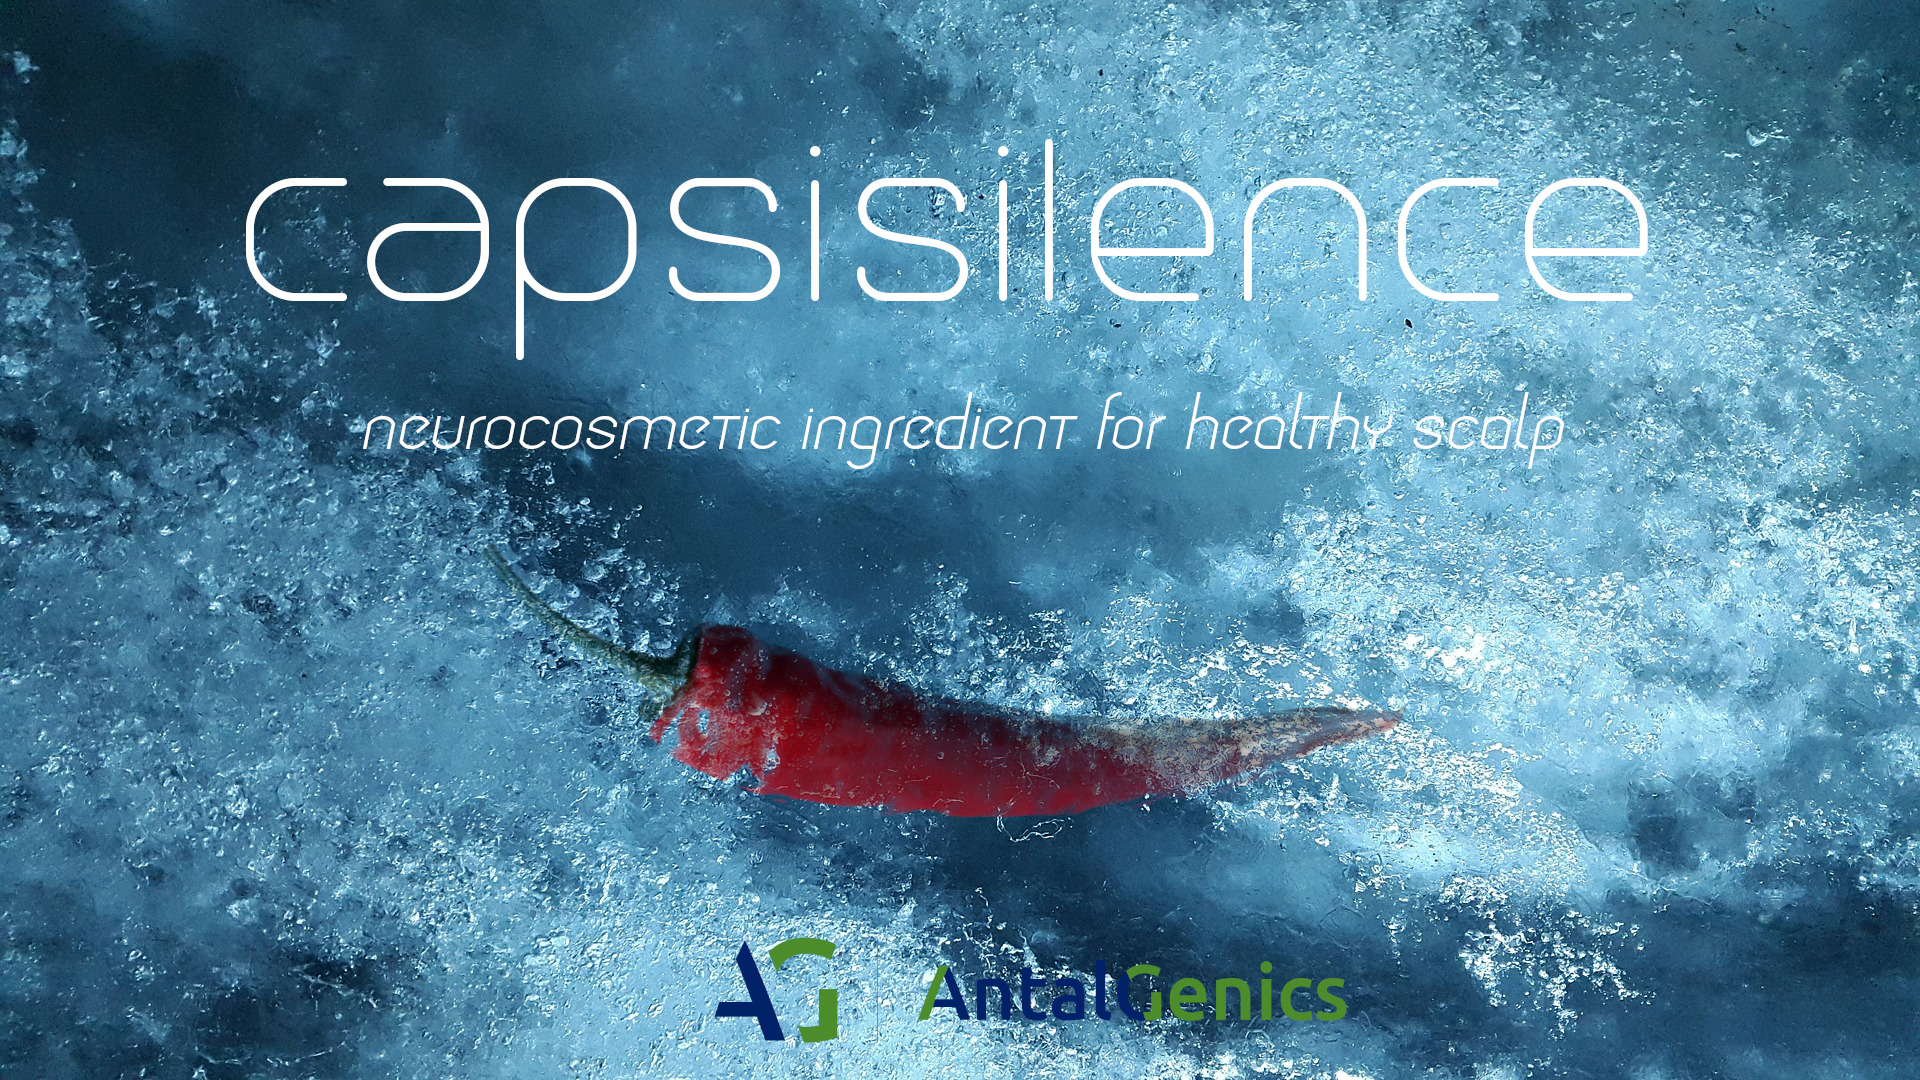 Capsisilence